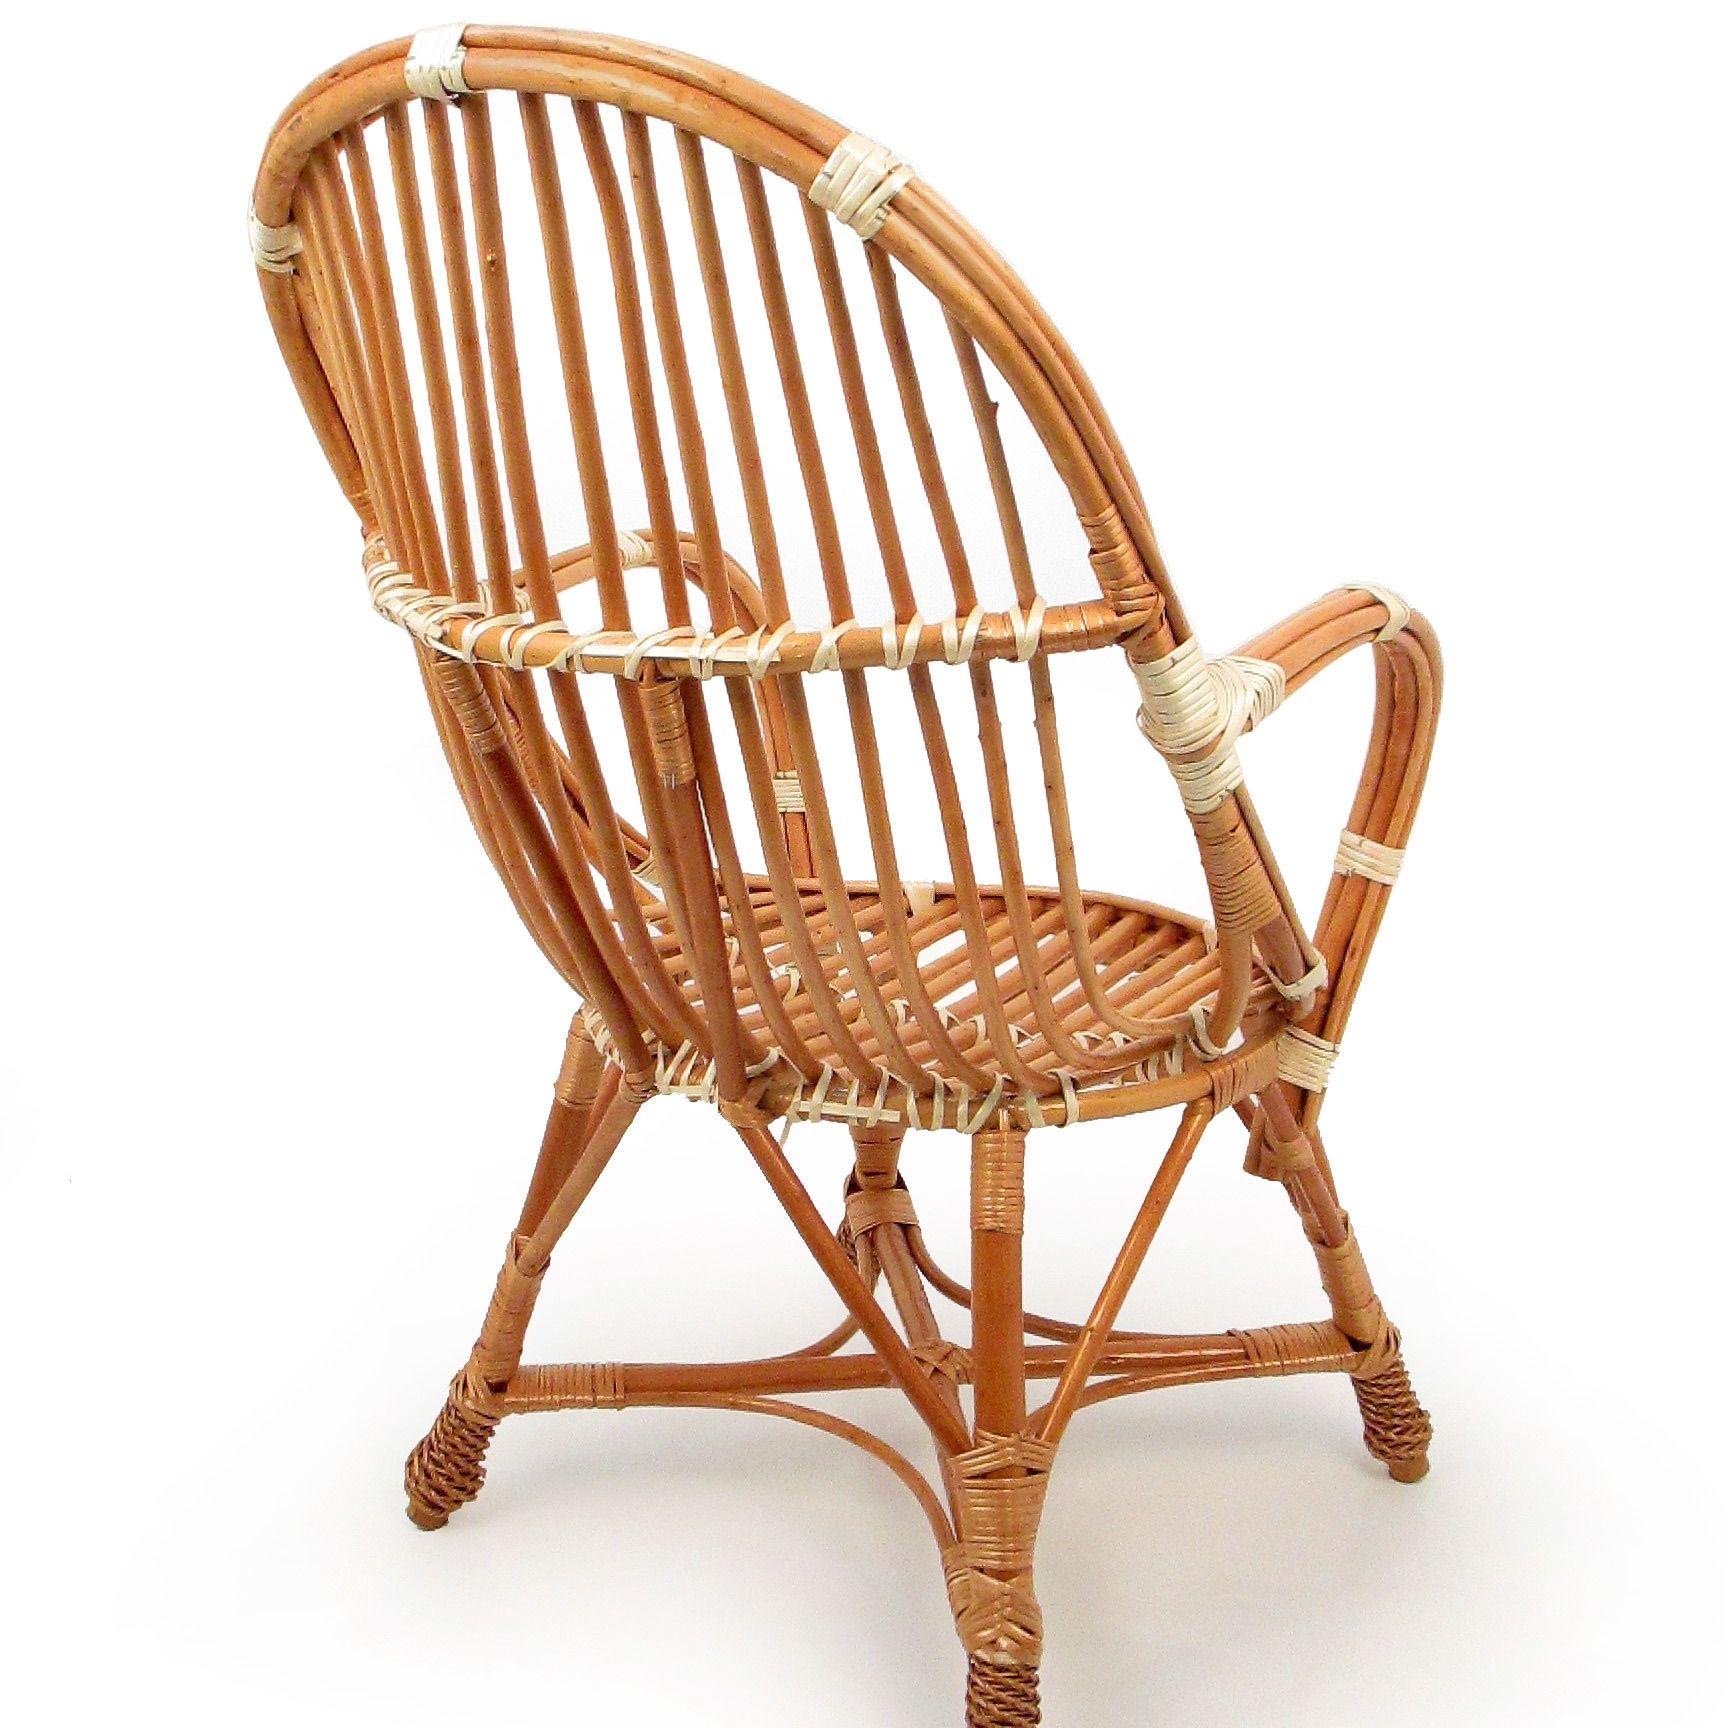 Kagyló fotel | Wicker chair, Chair, Wicker